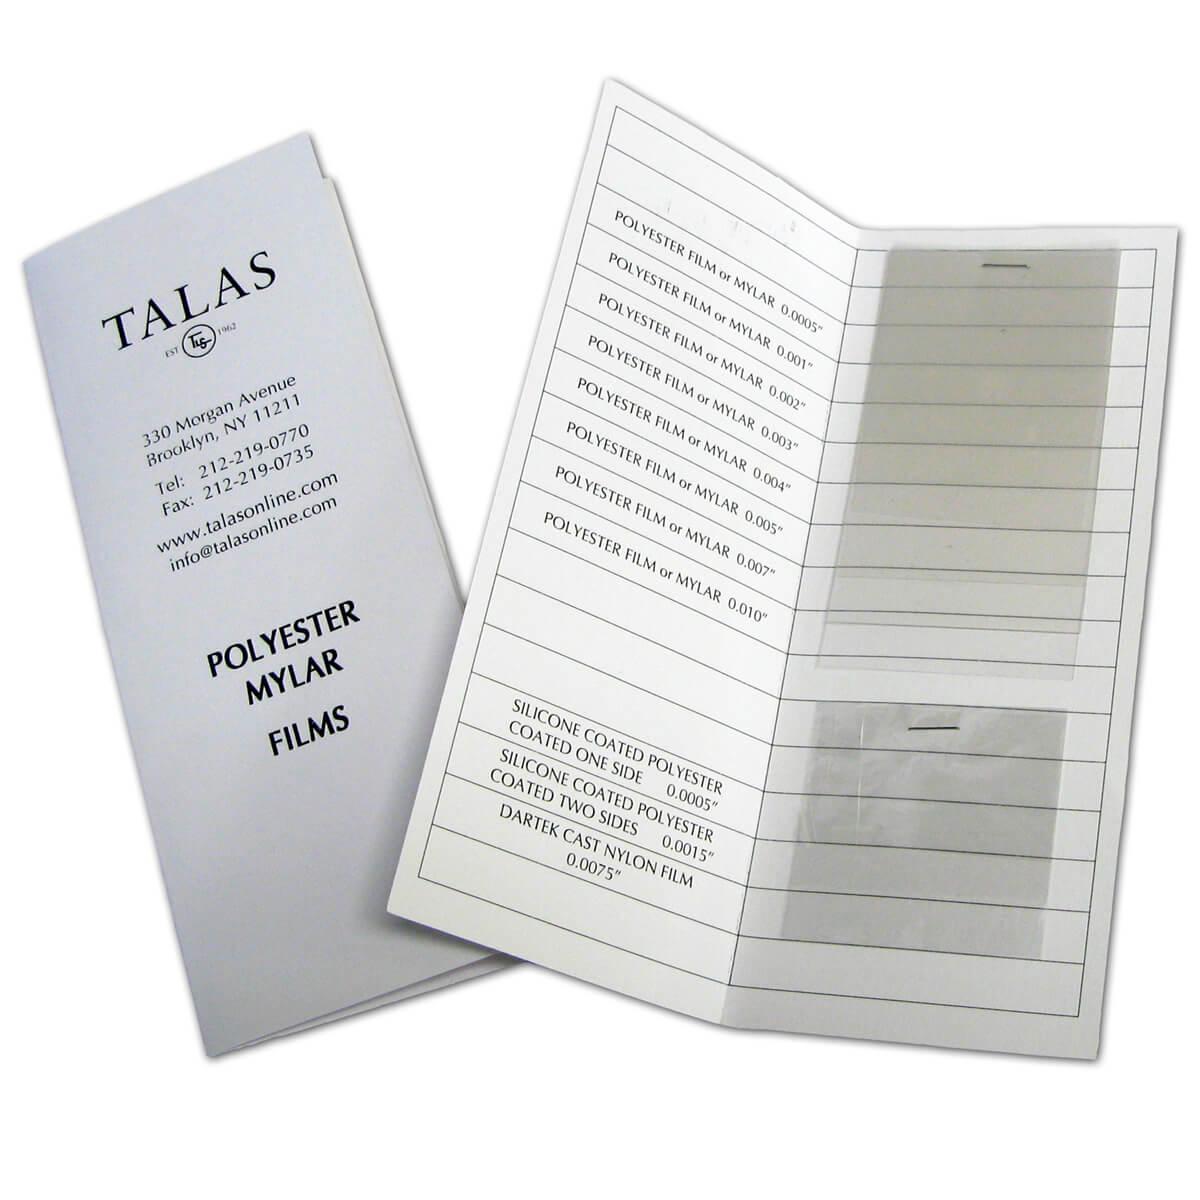 Archival Mylar Polyester Film Rolls | TALAS